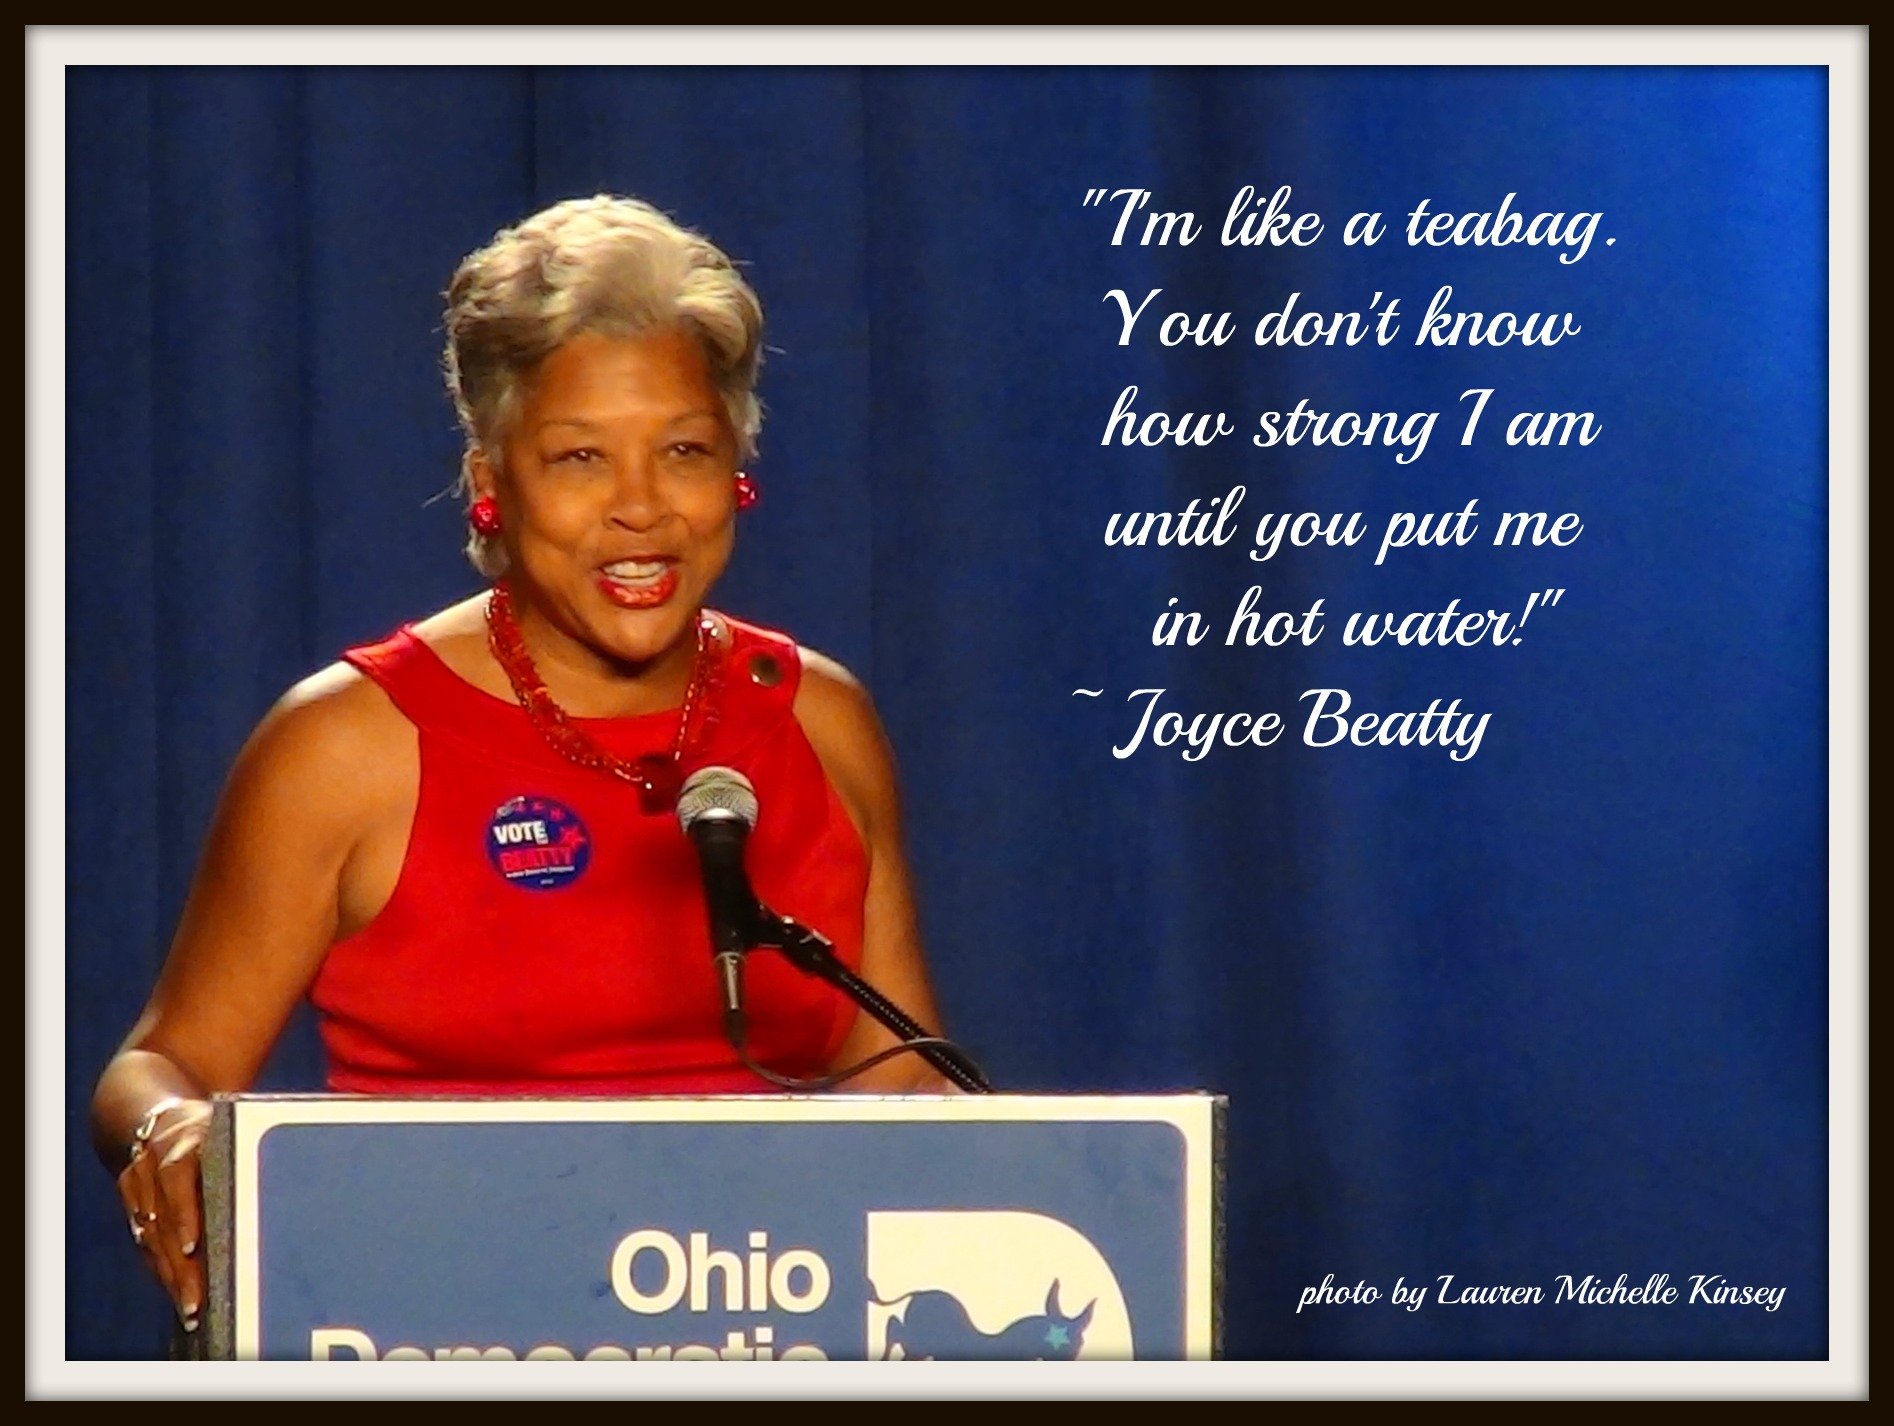 Beatty quote #2